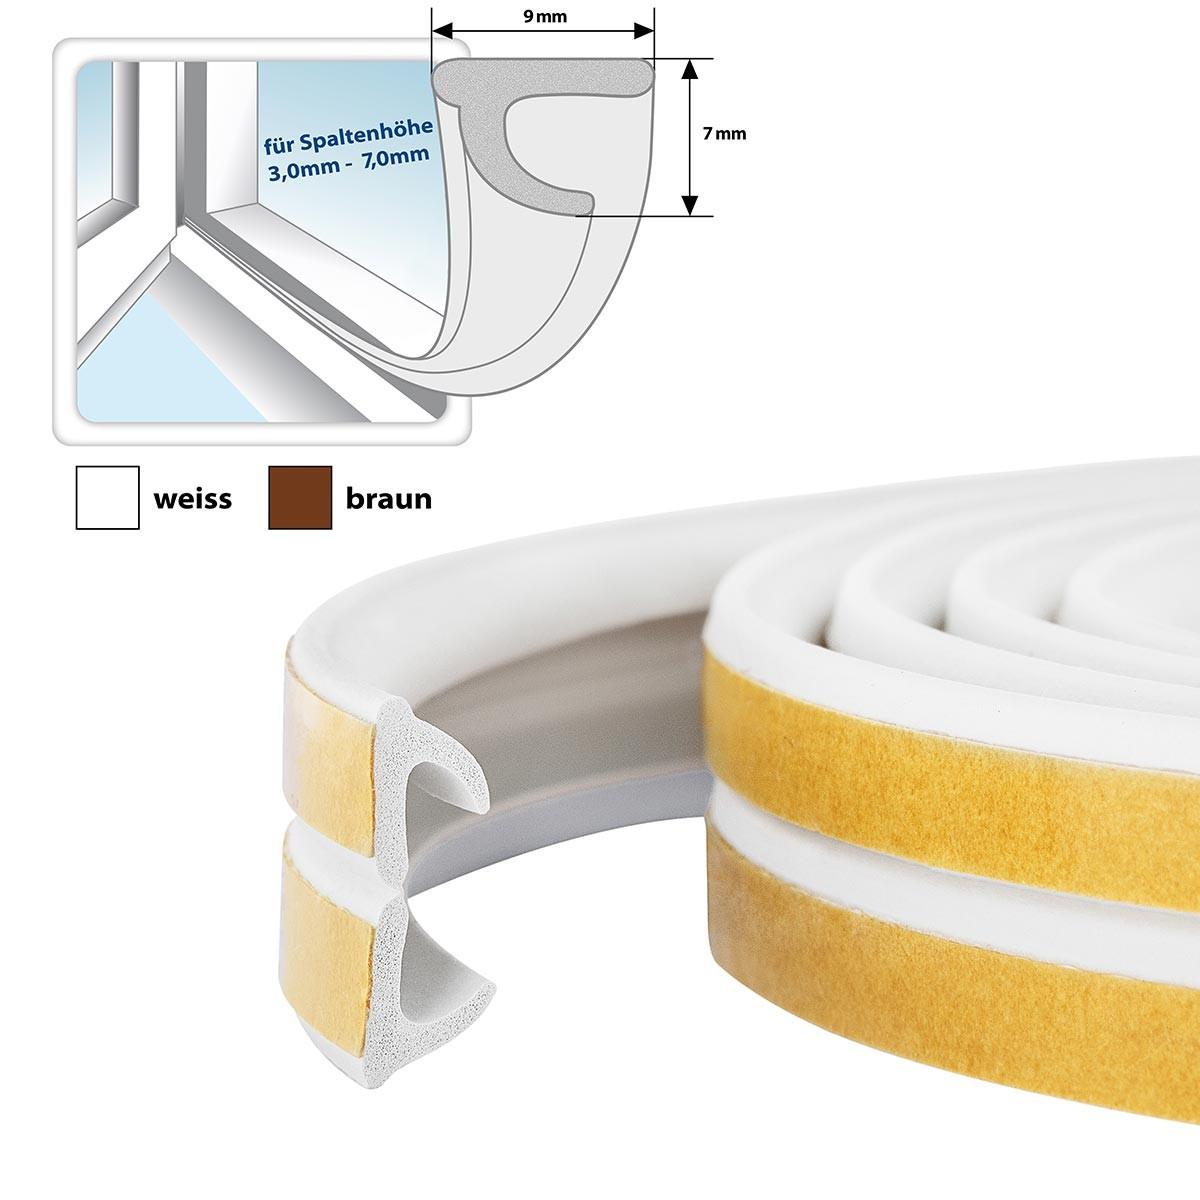 fensterdichtung gummidichtung selbstklebend wei v profil. Black Bedroom Furniture Sets. Home Design Ideas